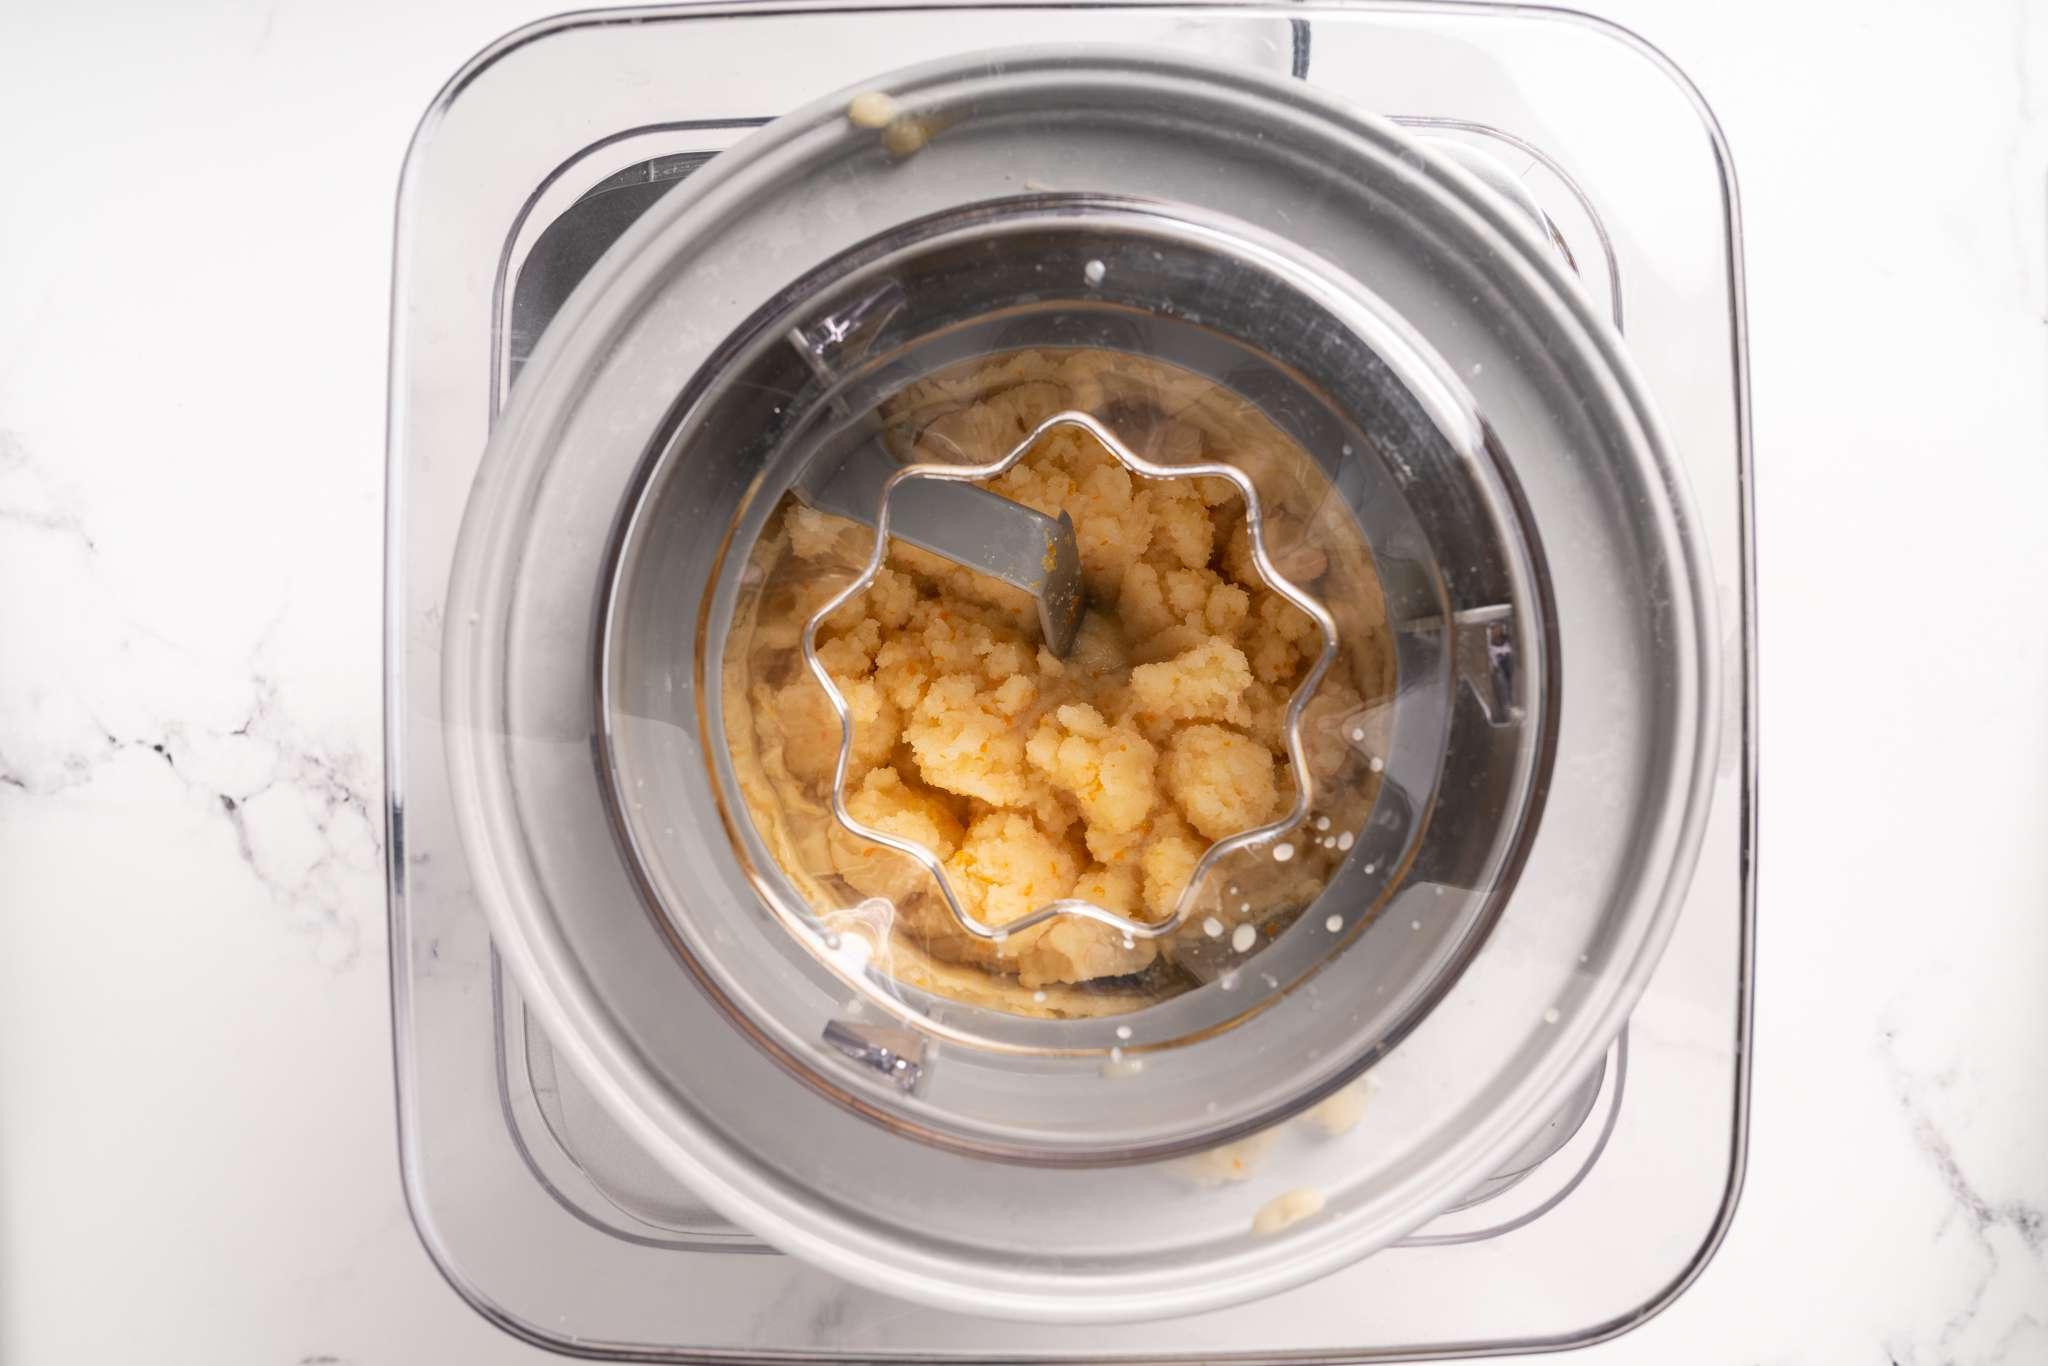 Orange Sorbet in an ice cream machine